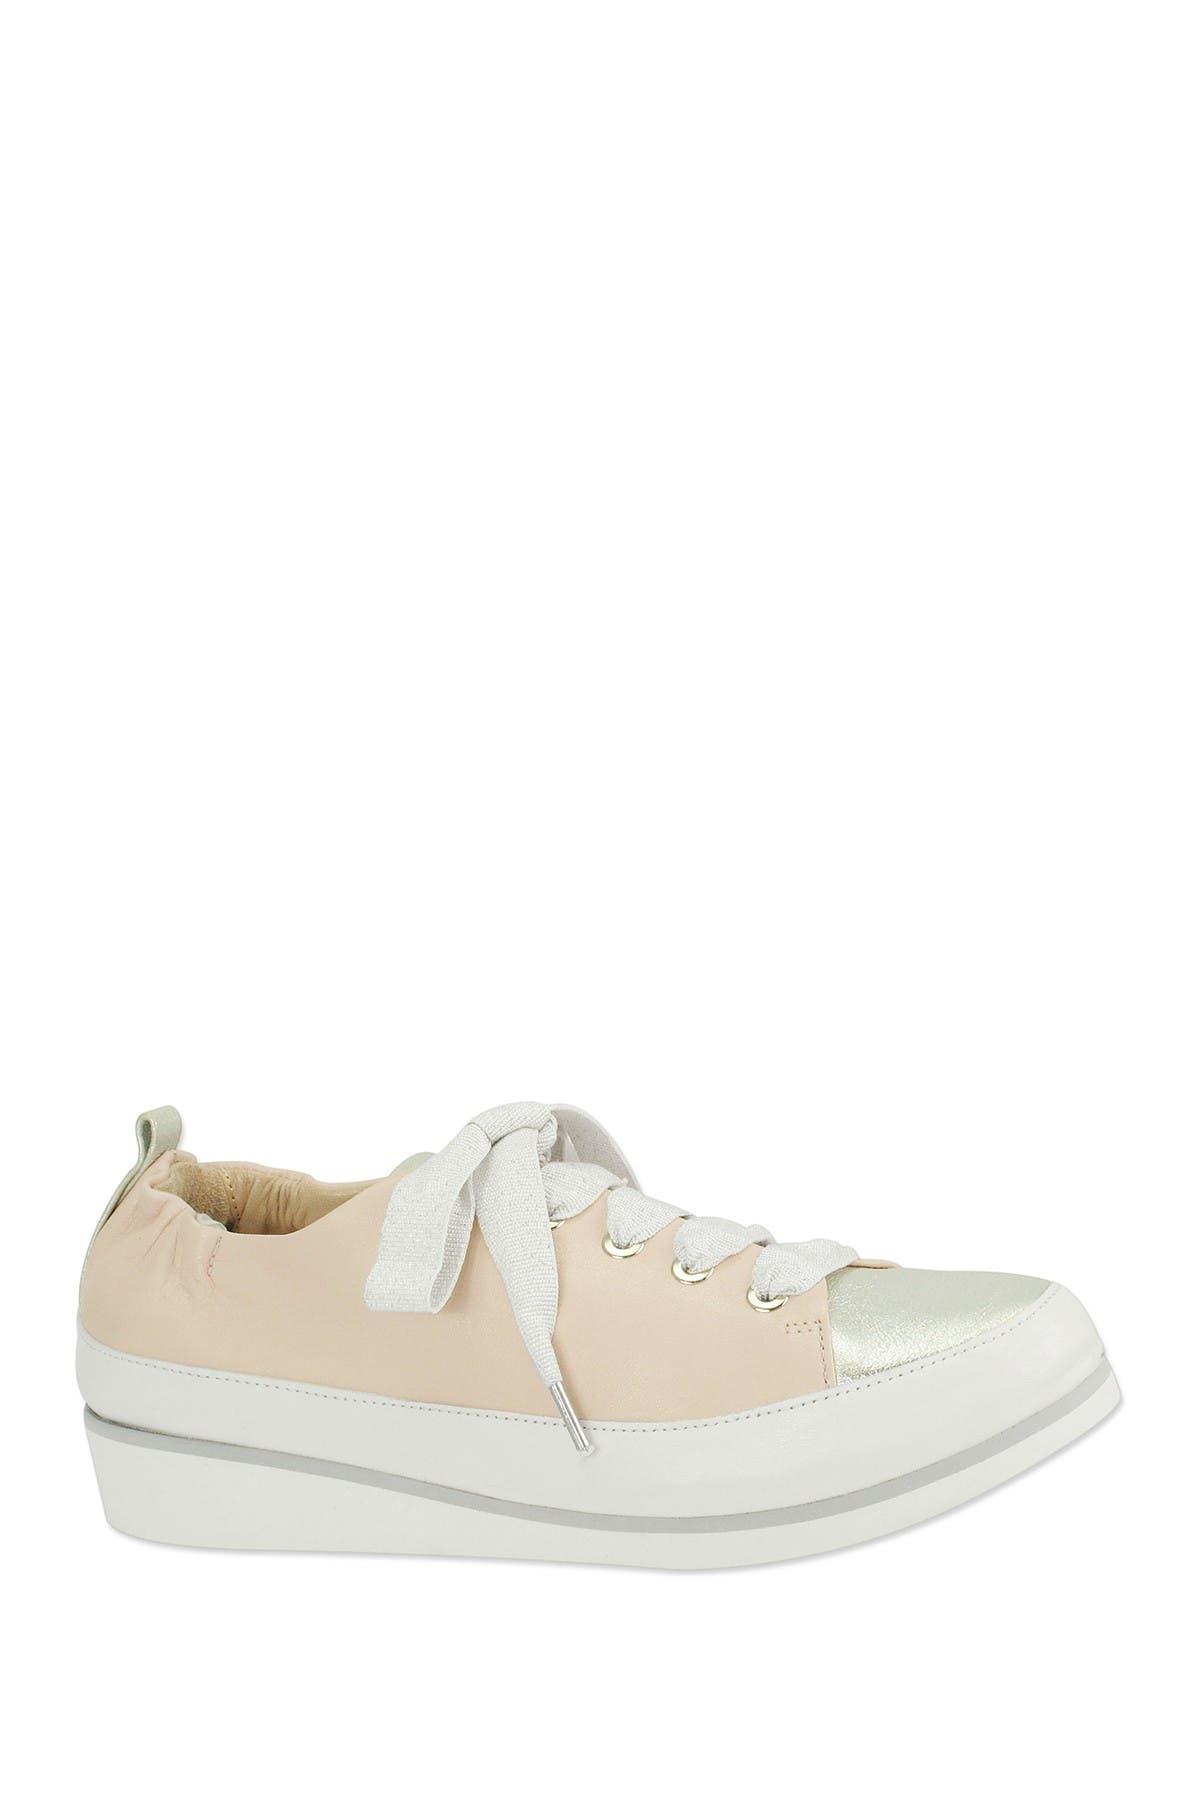 Image of RON WHITE Nova Sneaker